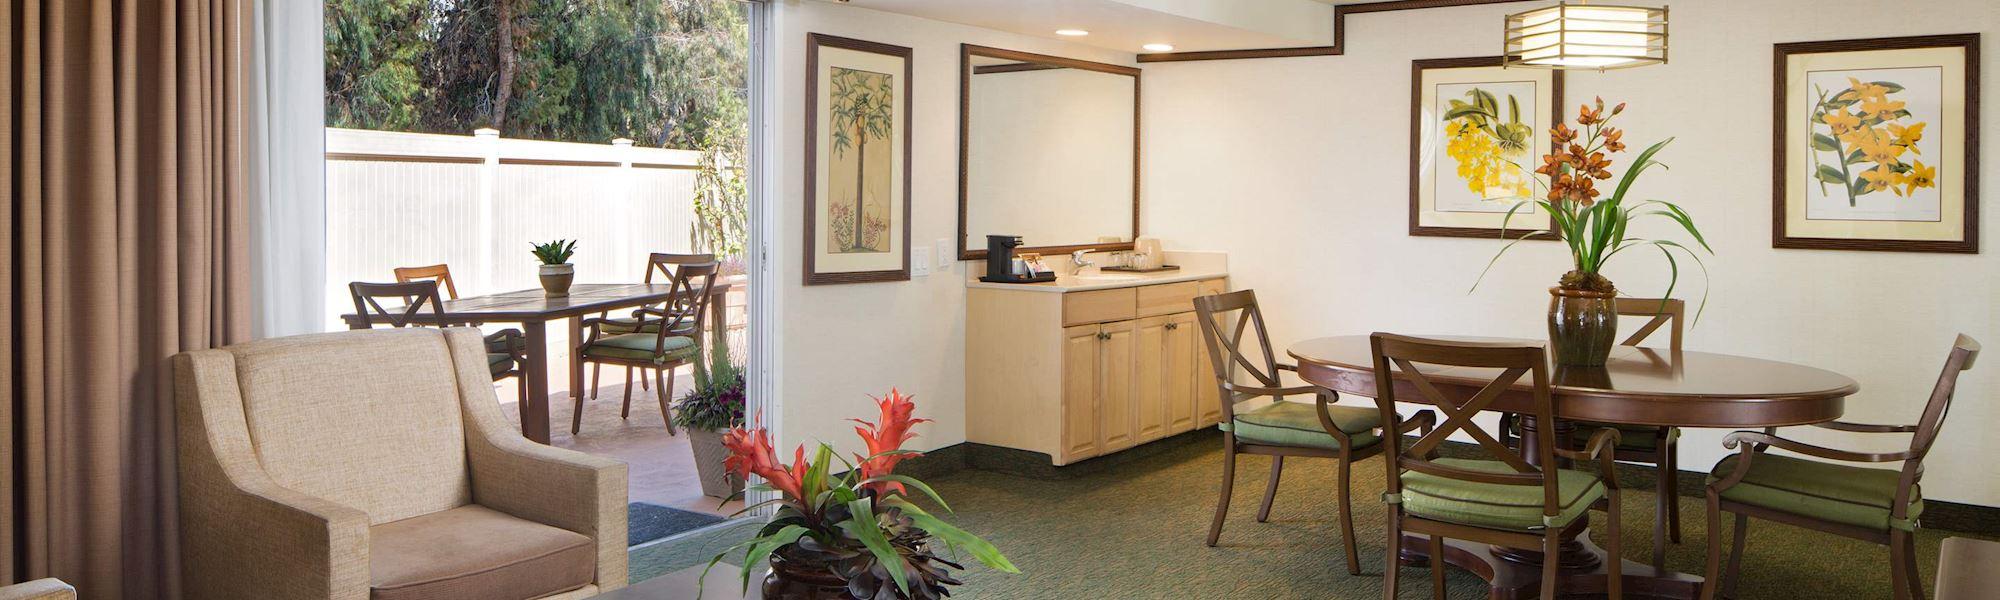 Rooms at BEST WESTERN Seven Seas, San Diego